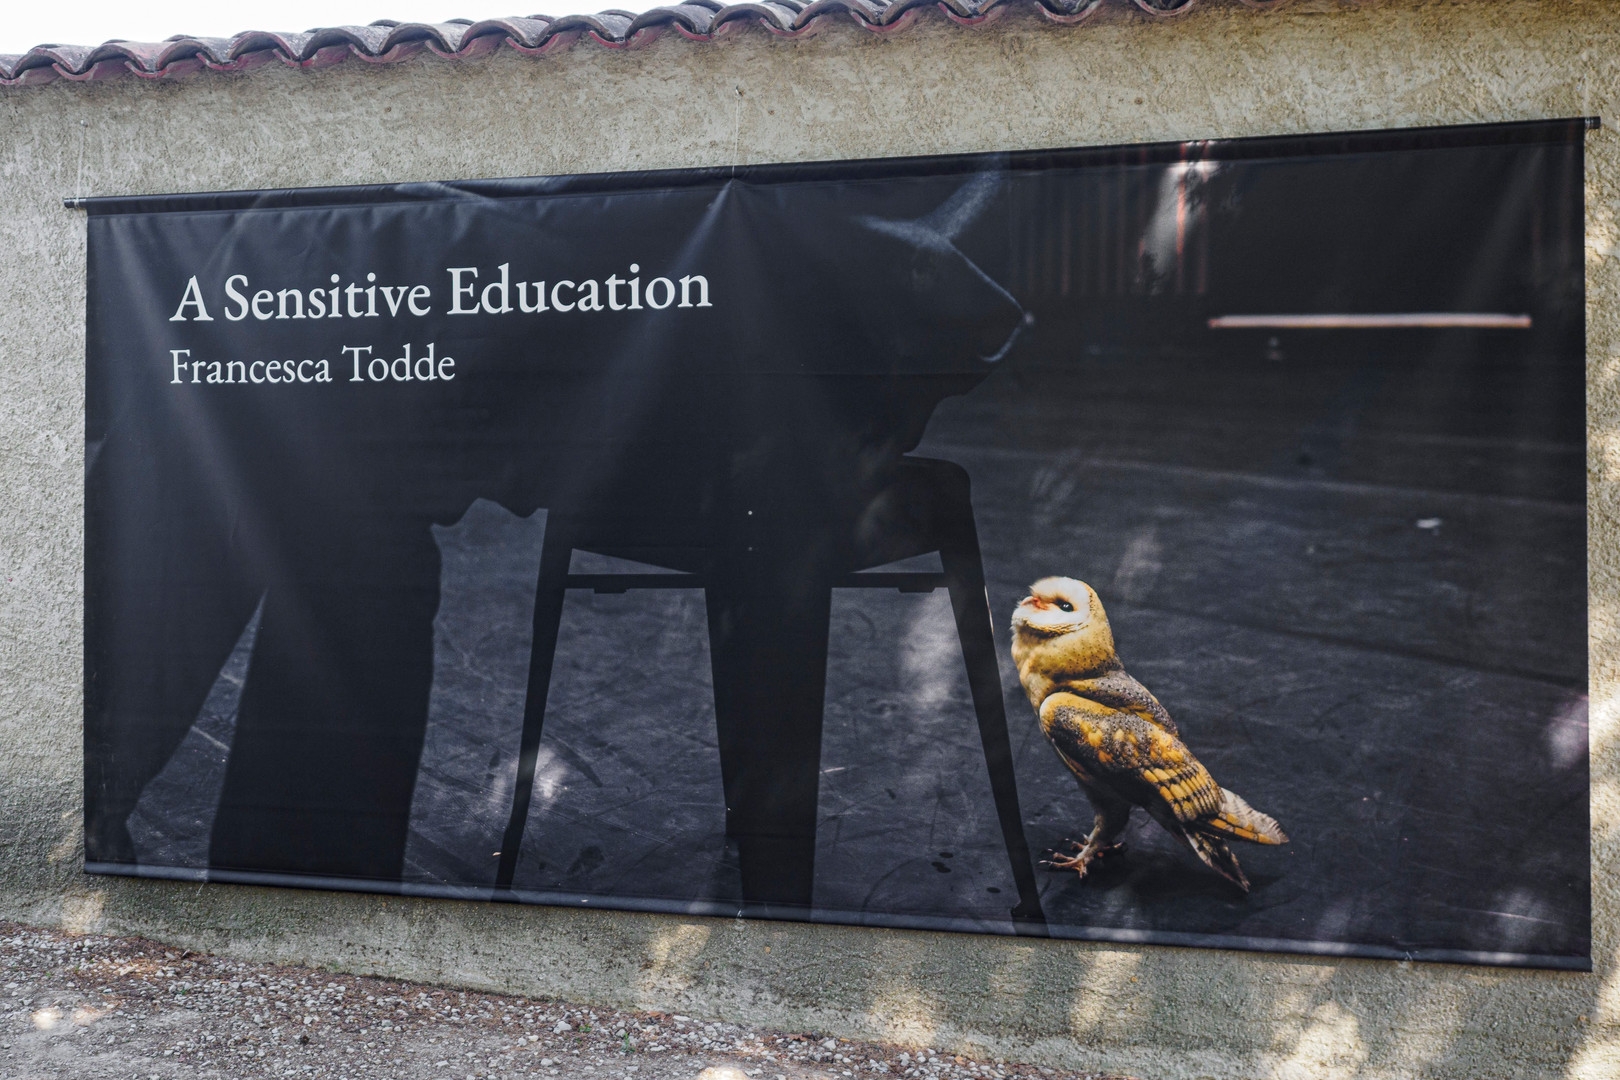 A Sensitive Education